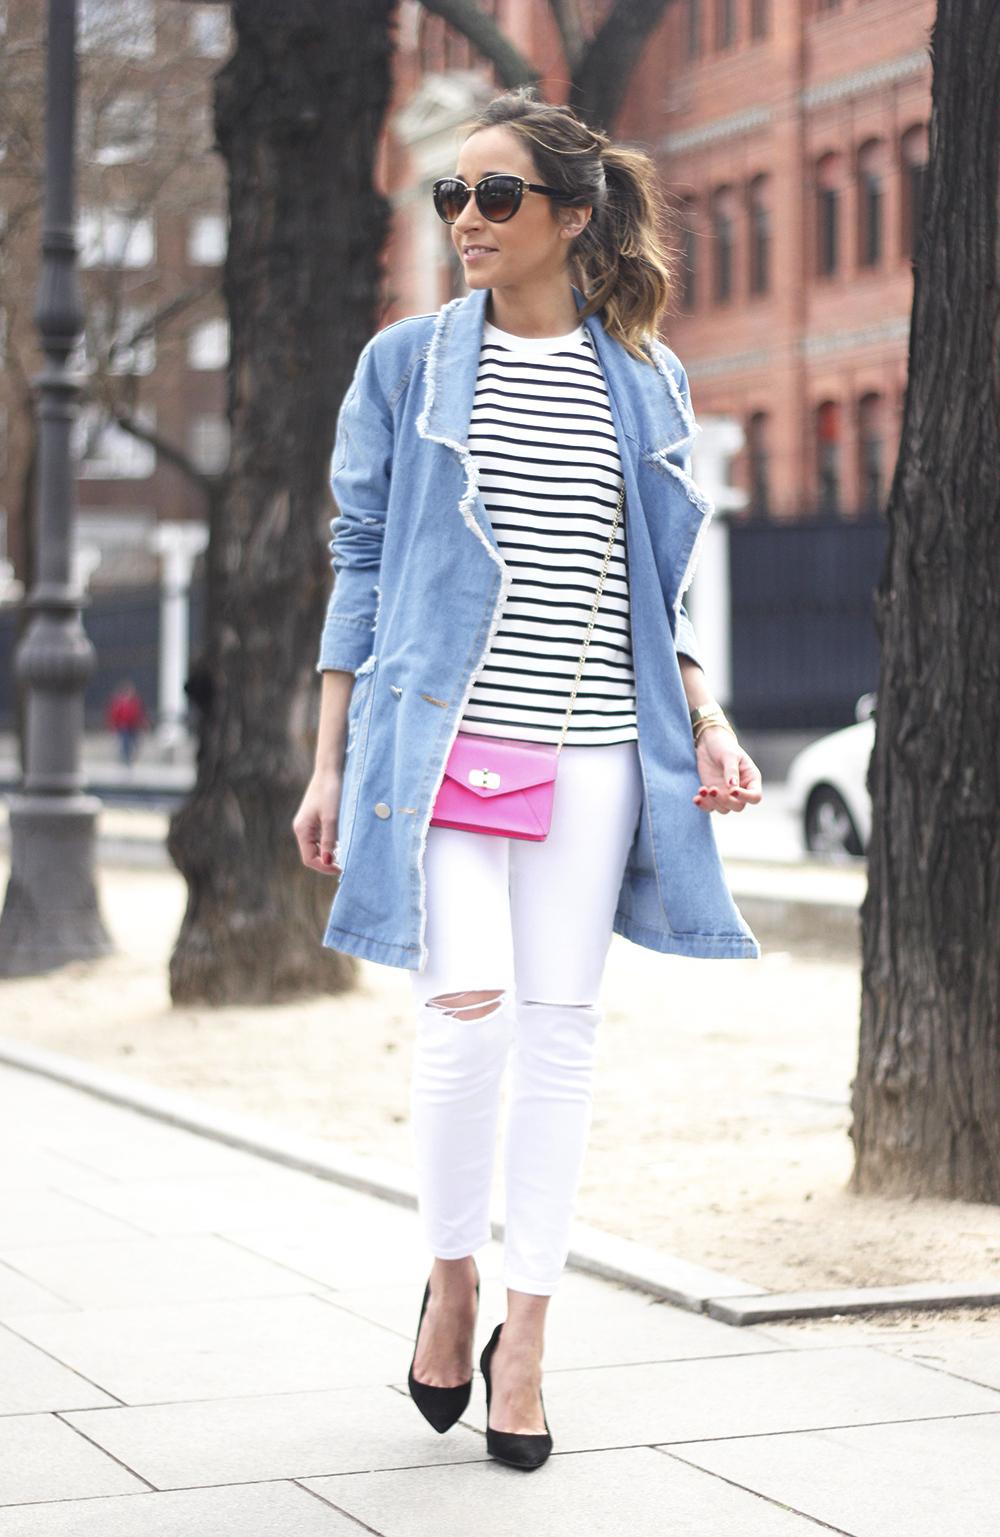 Stripes and Denim Coat Gloria Ortiz Heels Accessories Sunnies Outfit19